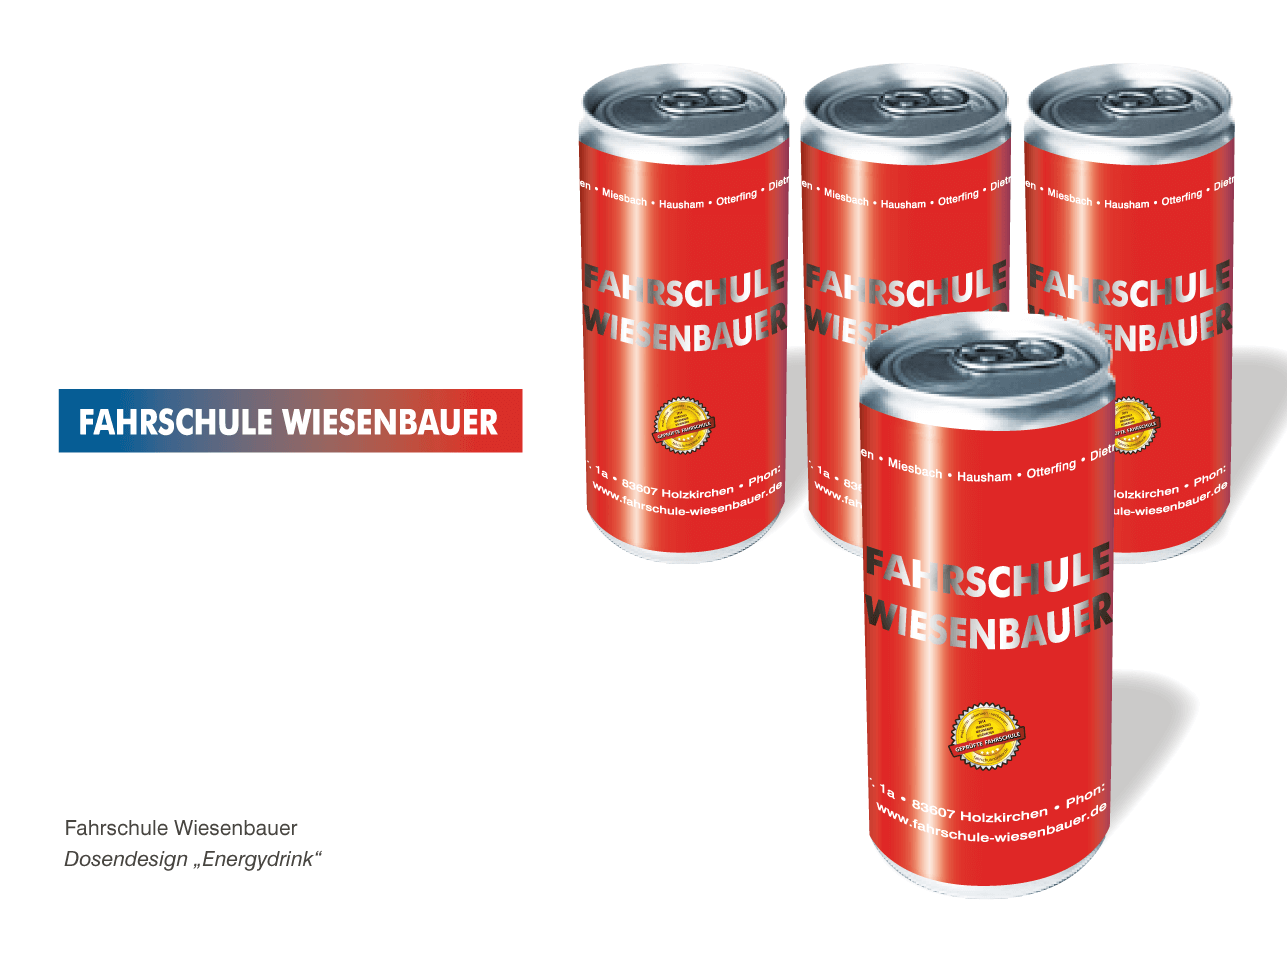 "Fahrschule Wiesenbauer - Dosendesign ""Energydrink"""